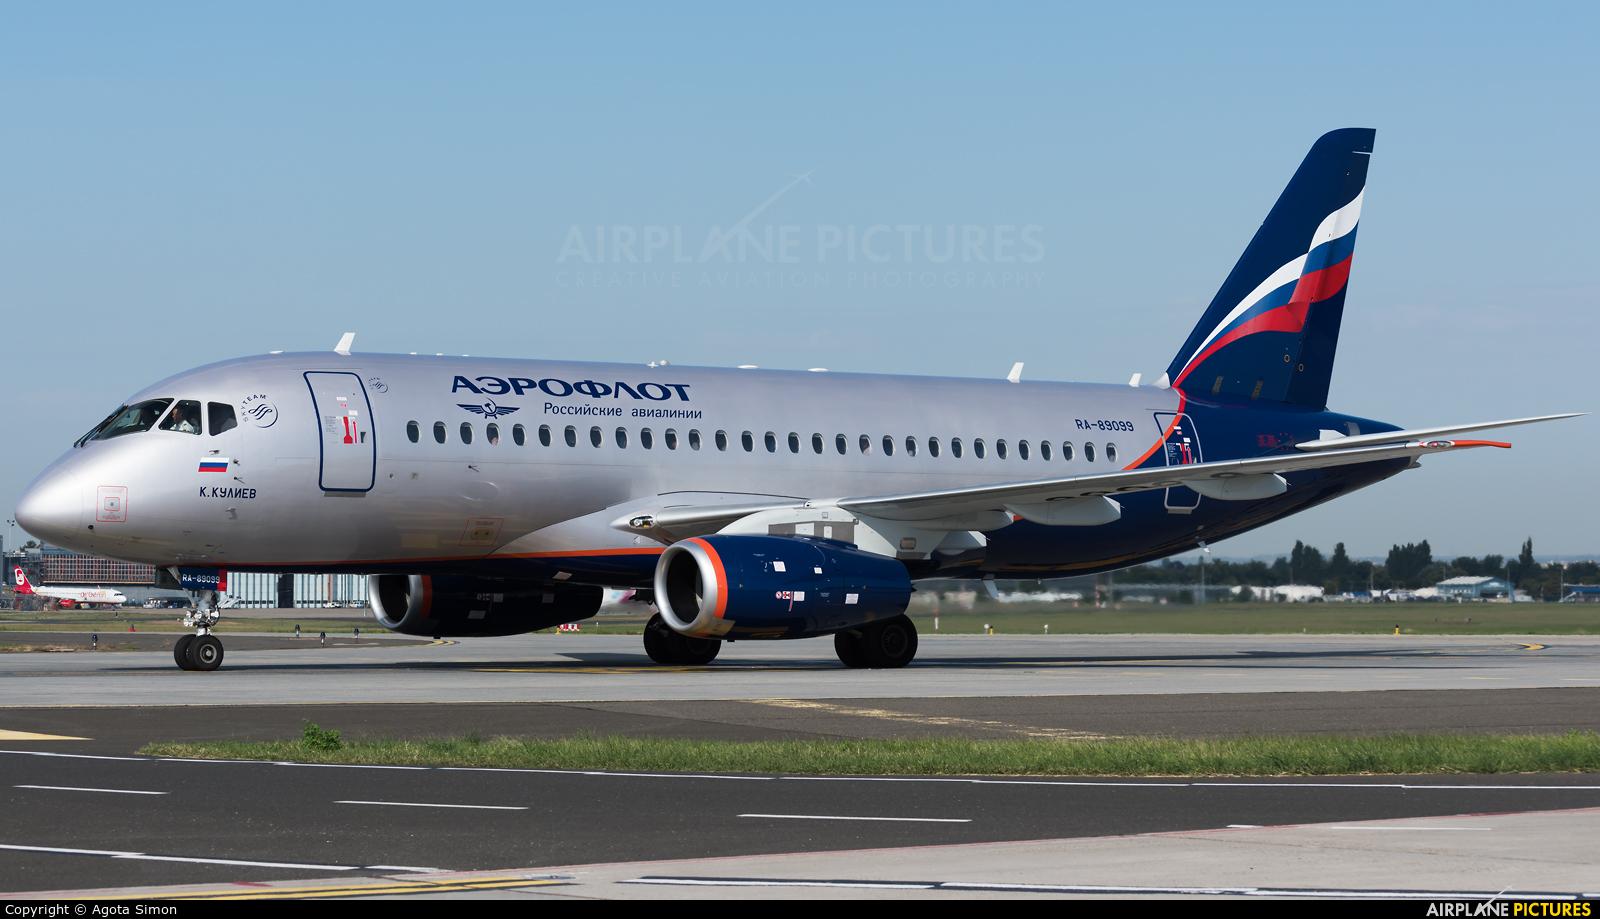 Aeroflot RA-89099 aircraft at Budapest Ferenc Liszt International Airport